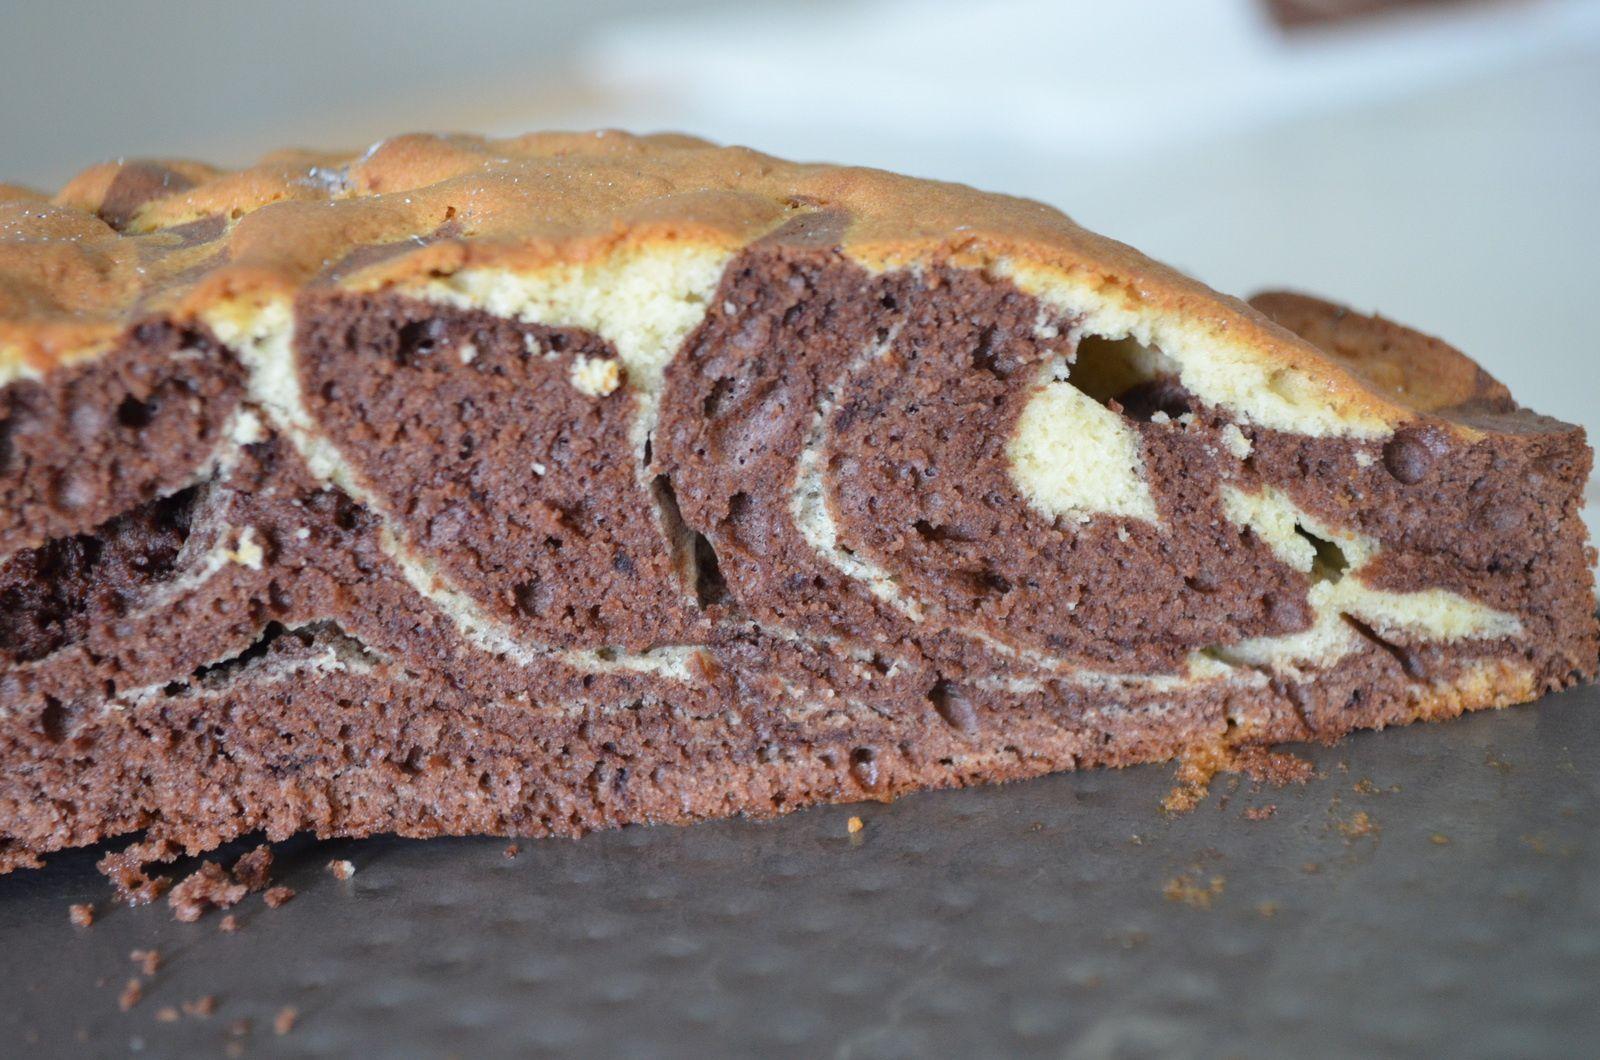 Gâteau marbré, type savane